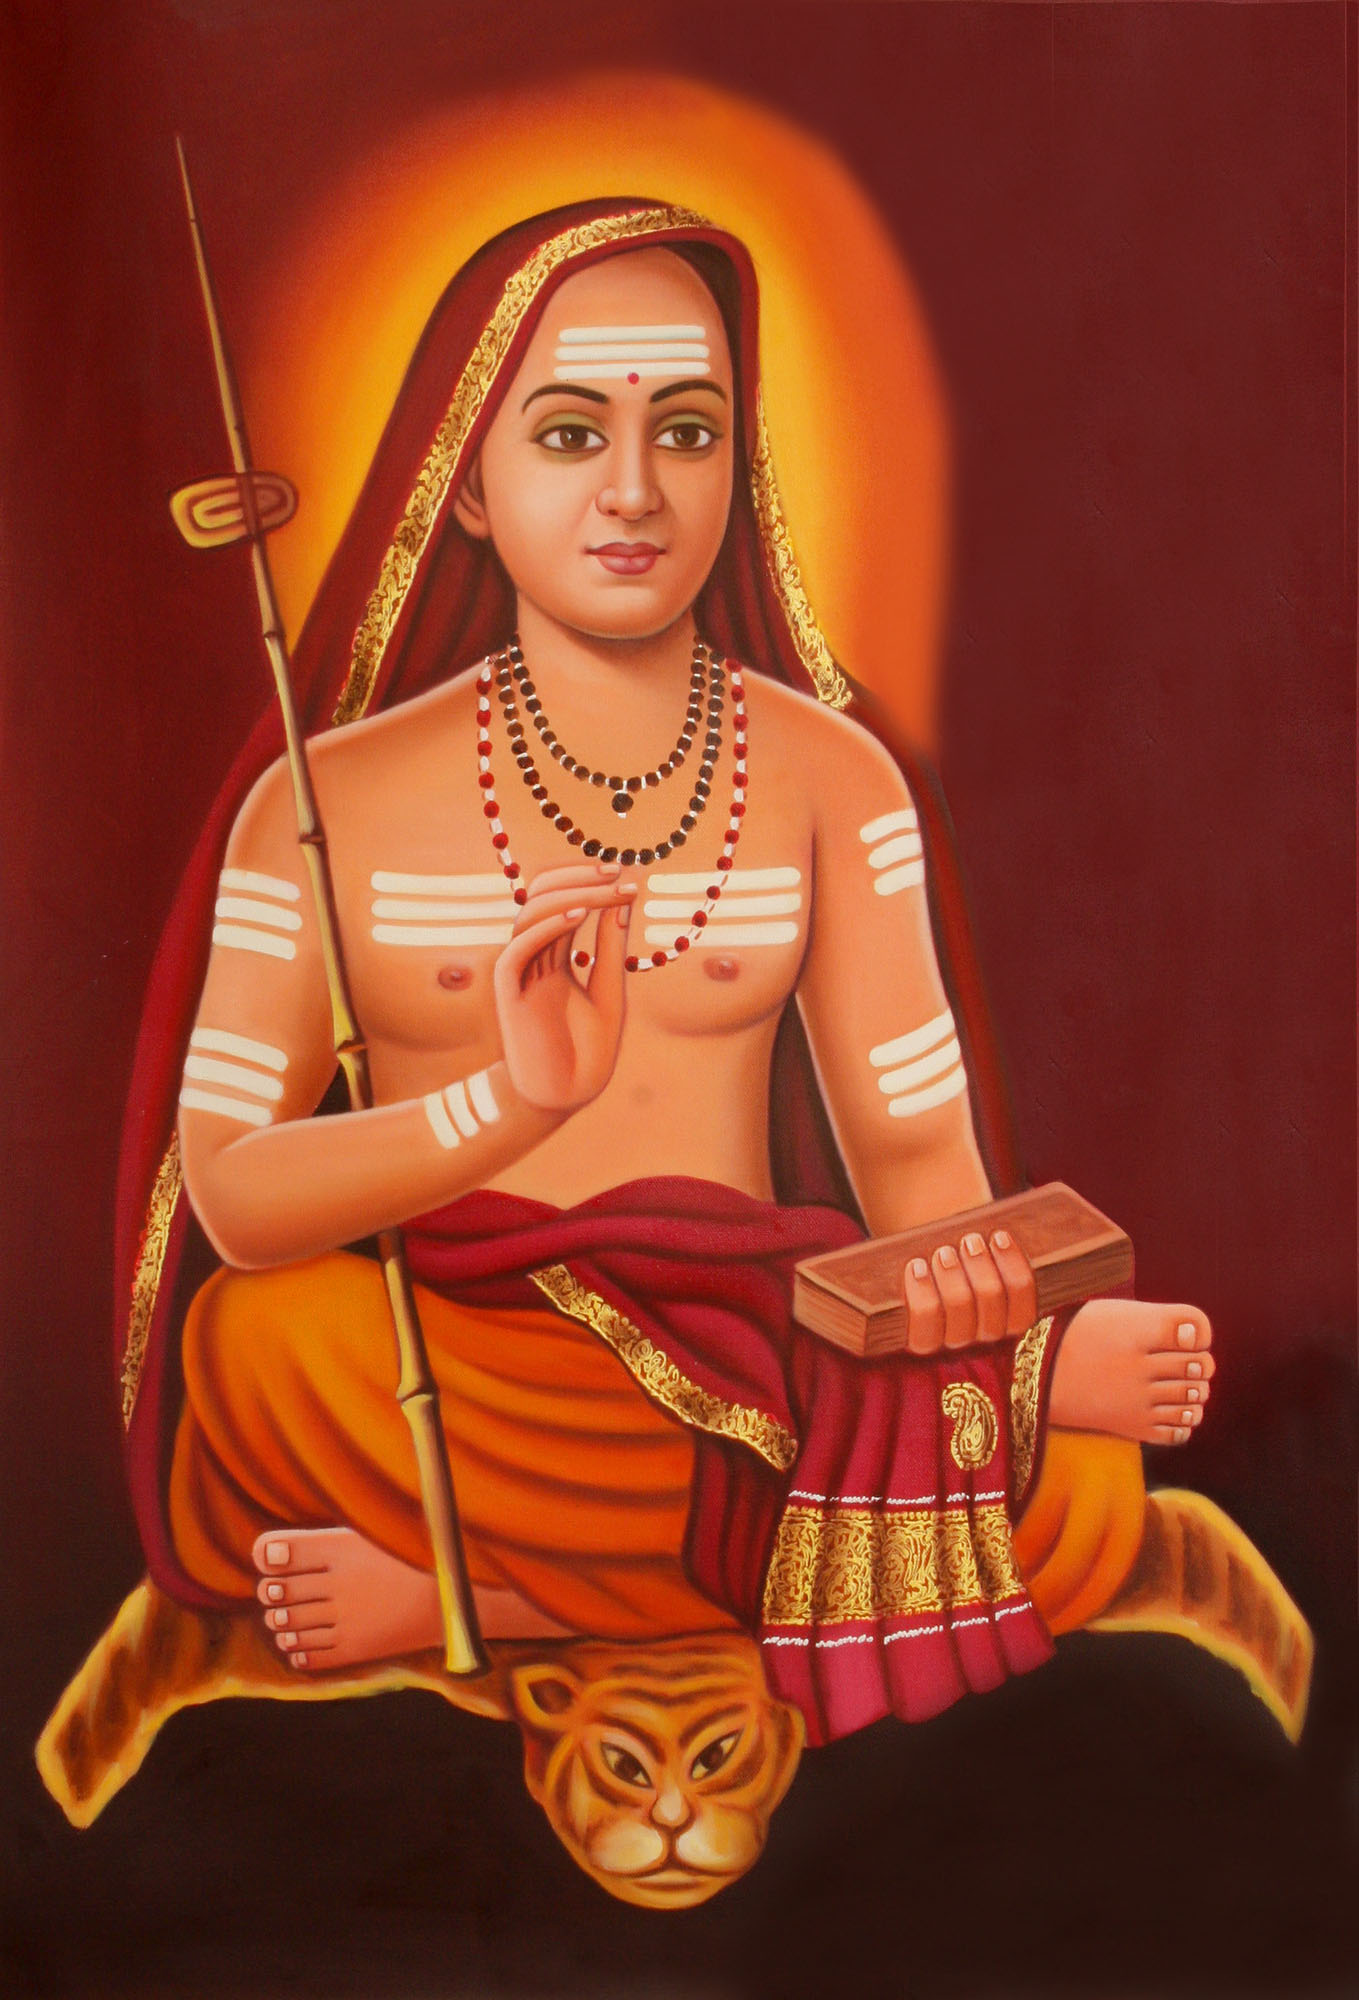 Happy Adi Shankaracharya Jayanti Photos for Free Download